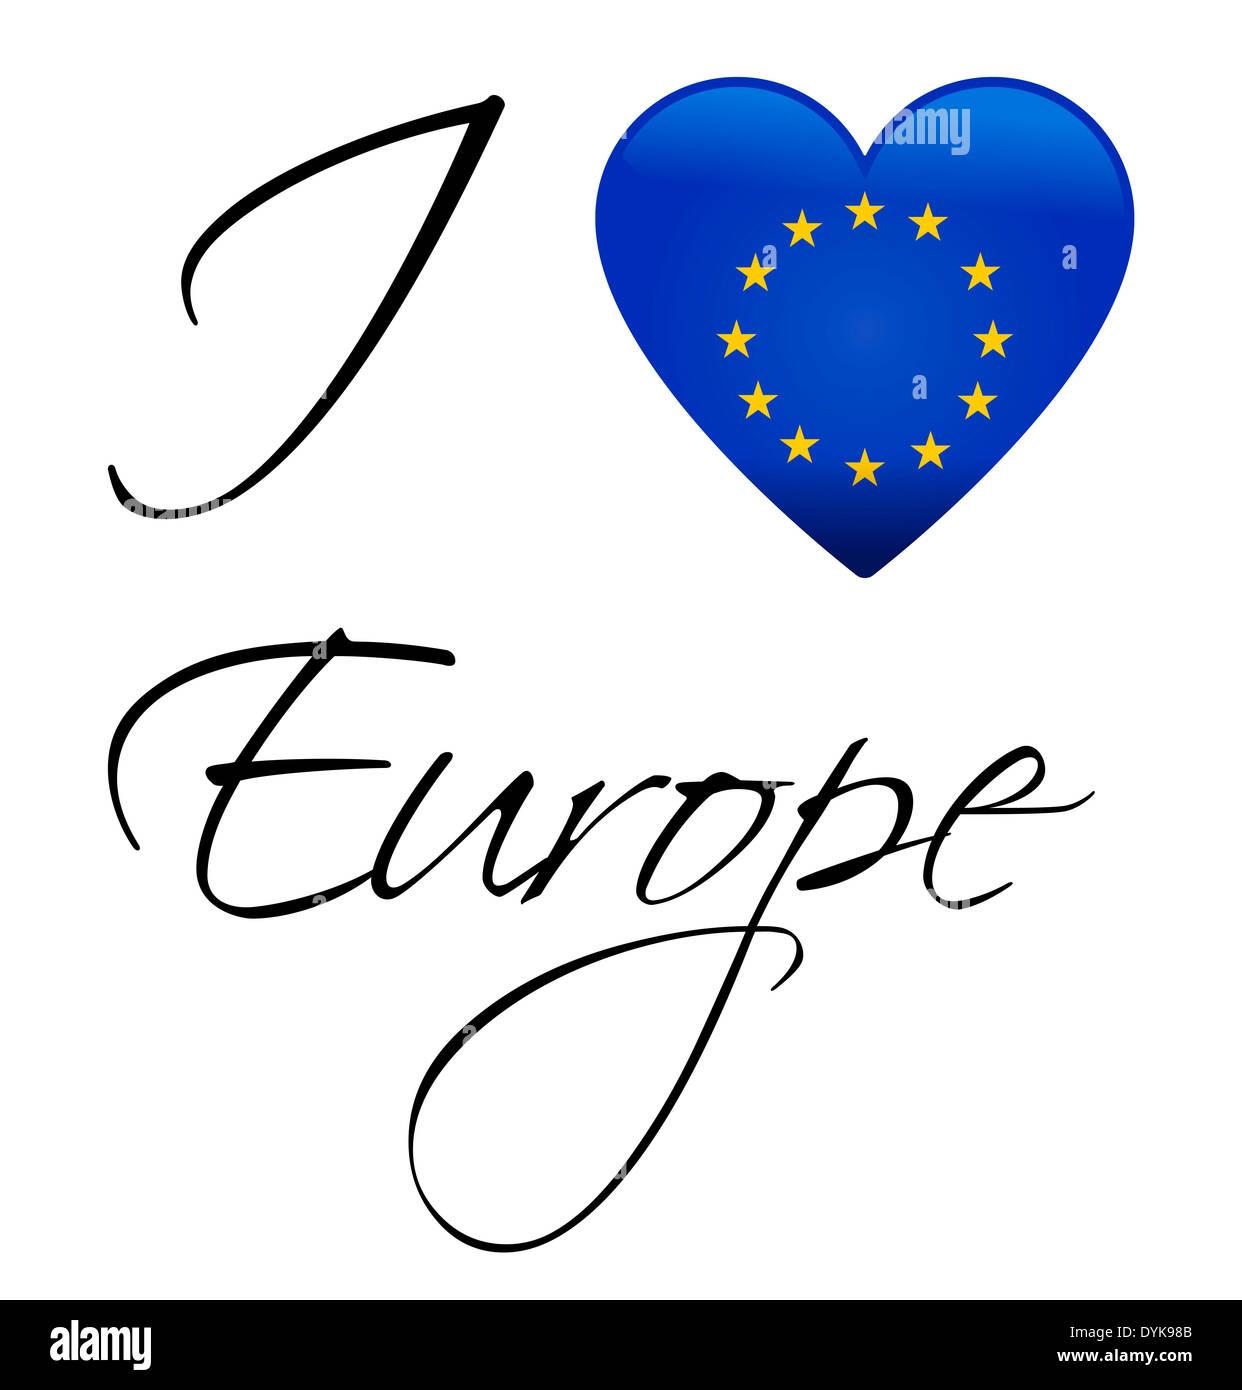 I Love Europe - European union flag - Stock Image